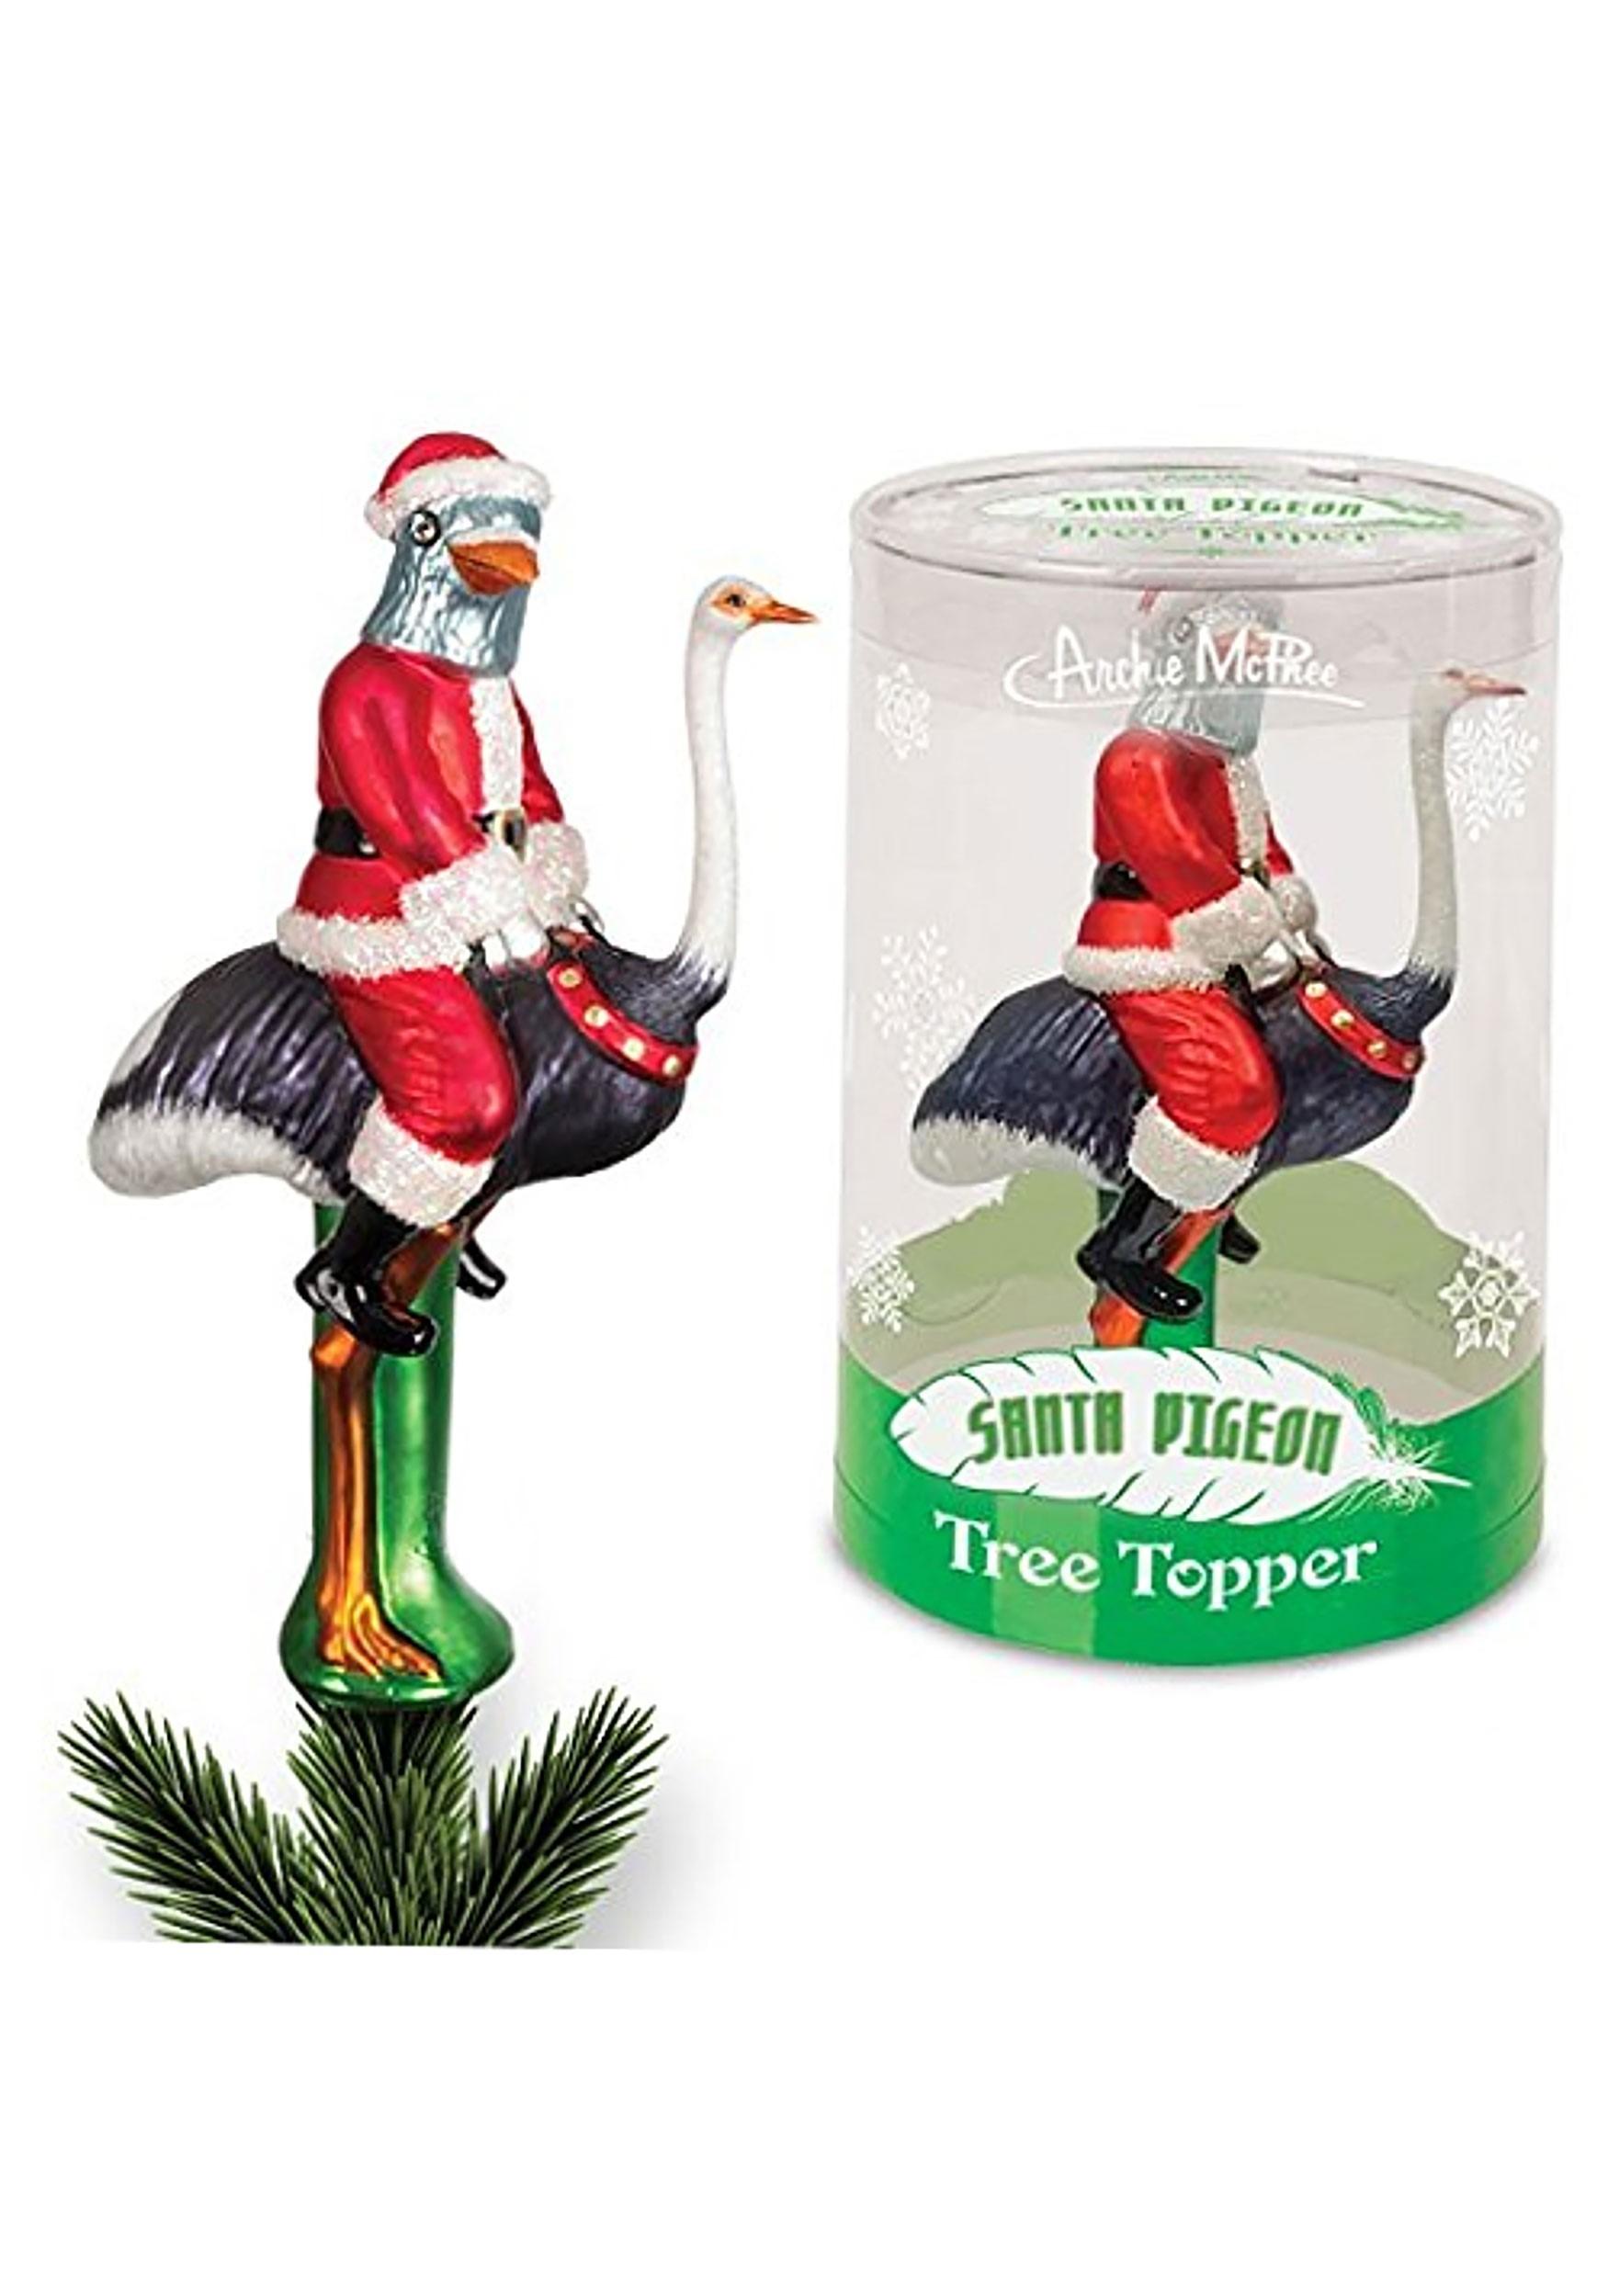 Santa_Pigeon_Christmas_Tree_Topper